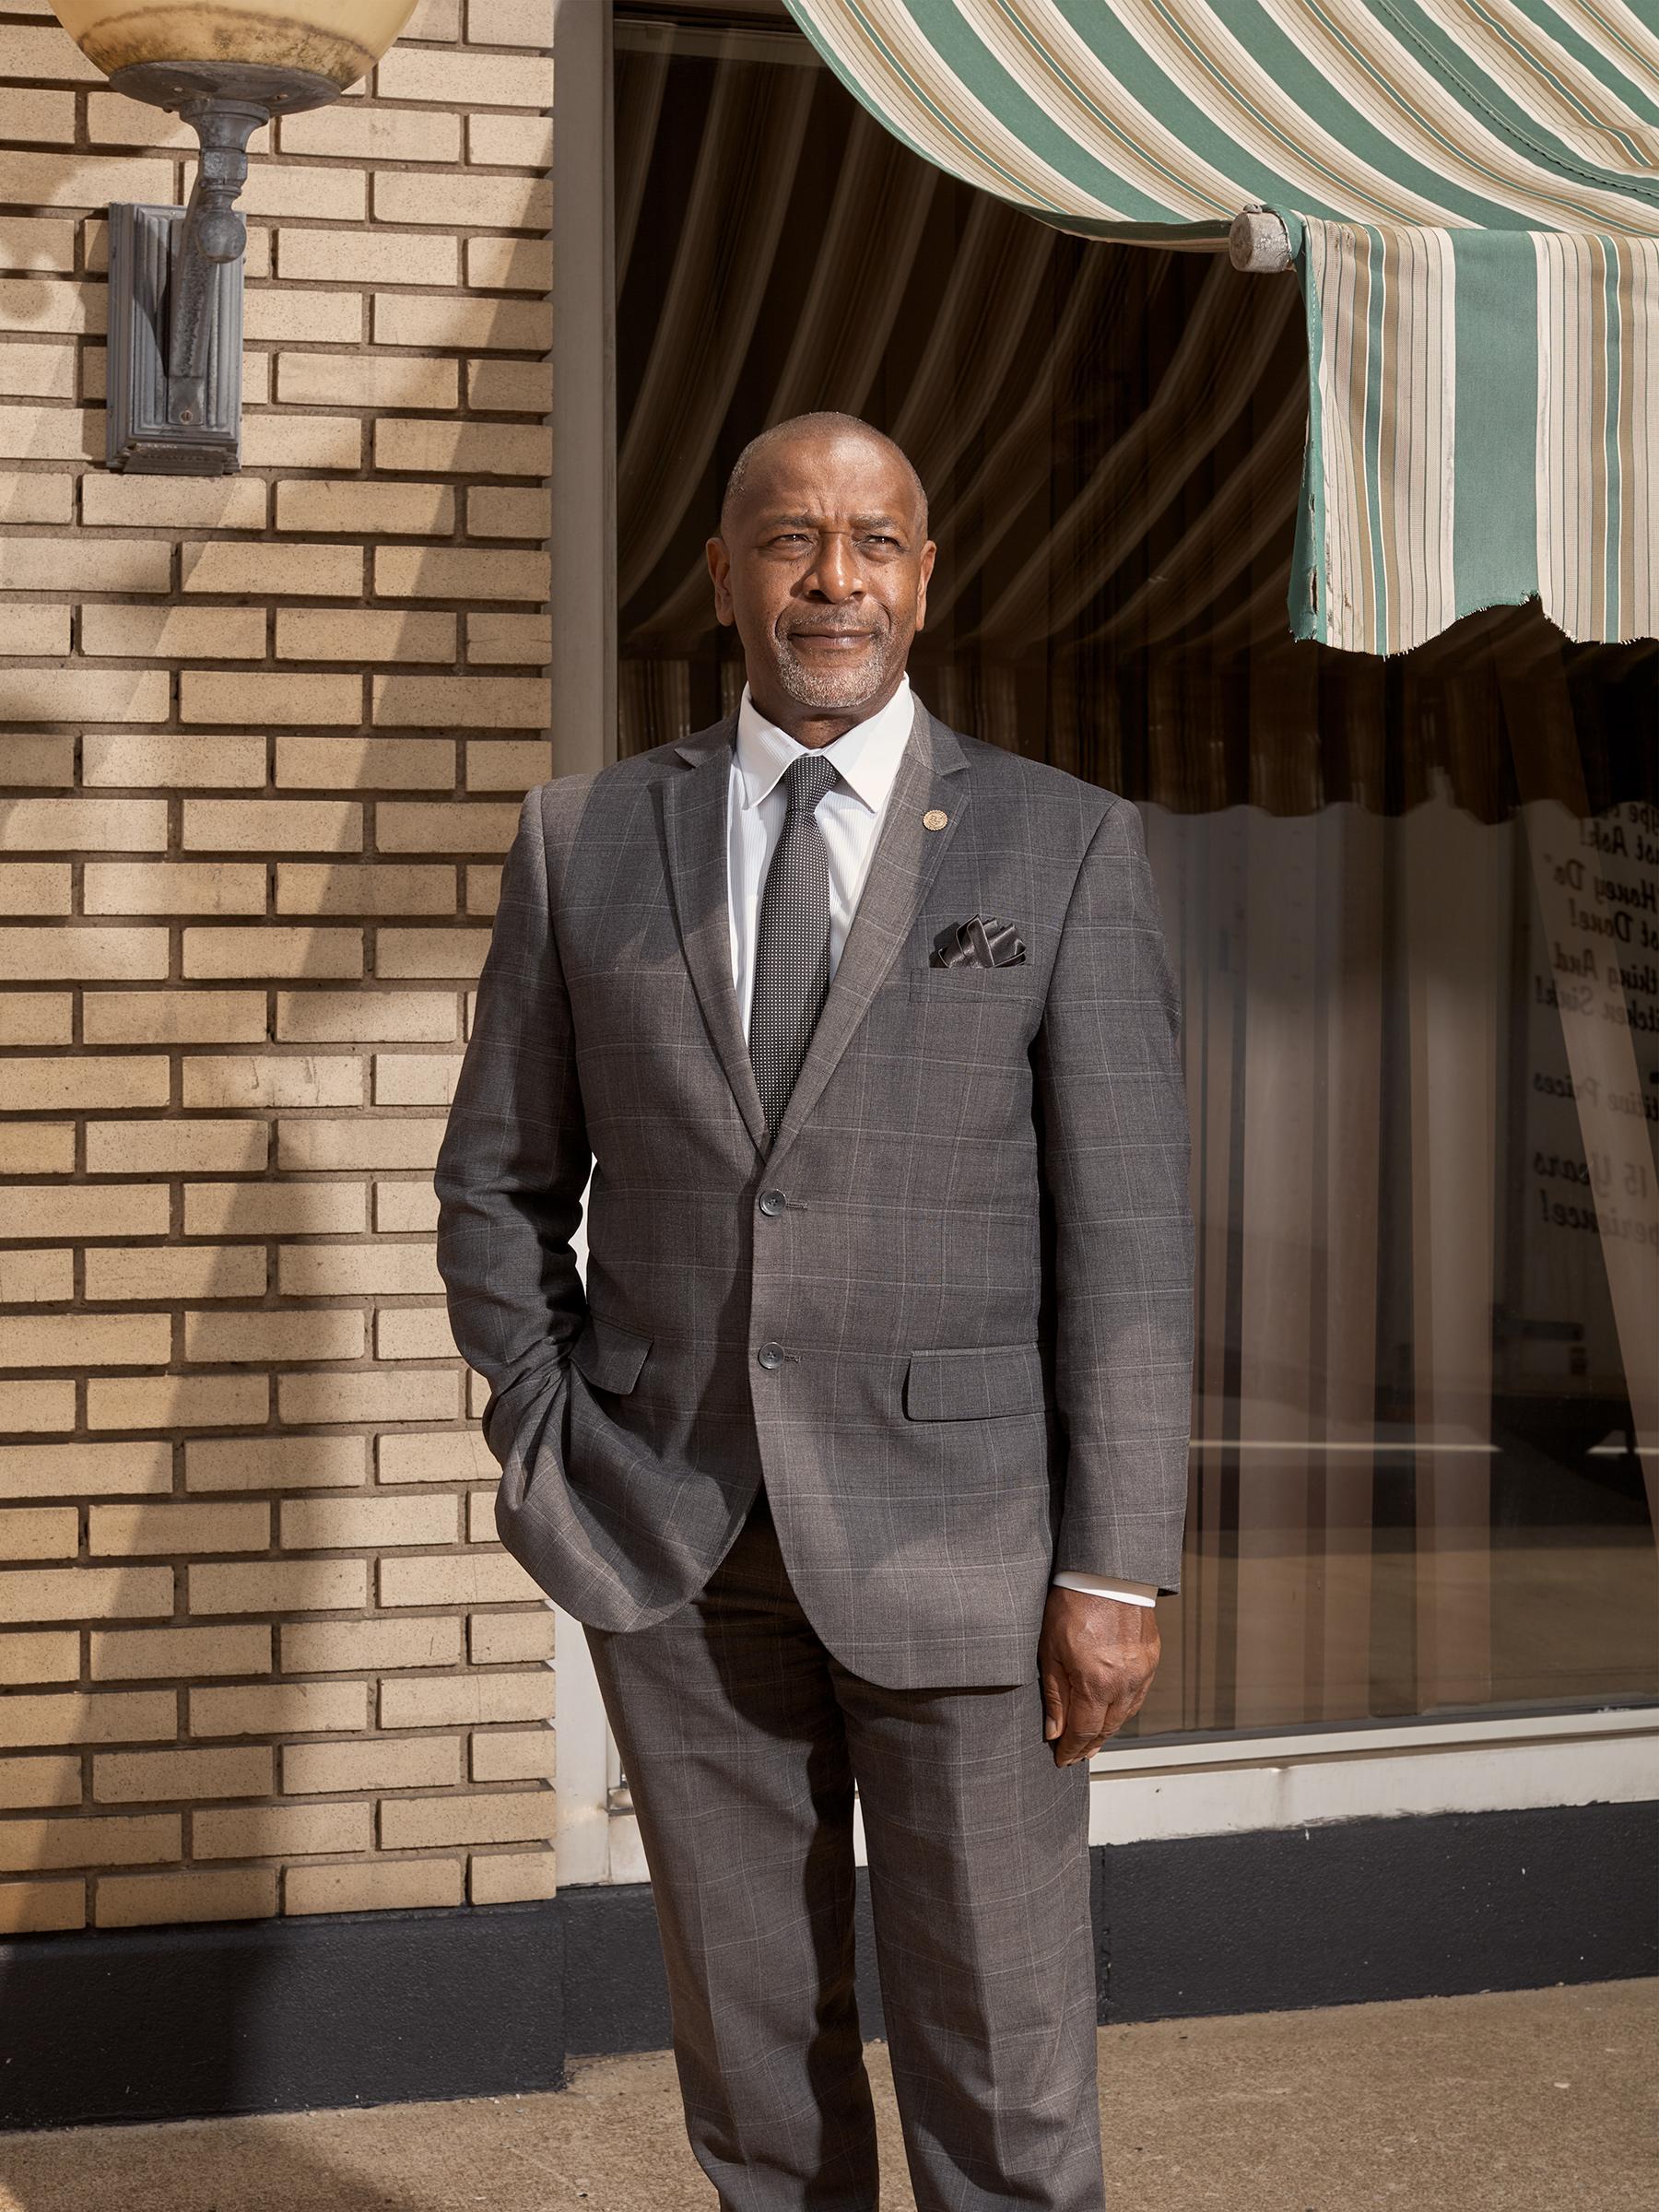 Franklin, Mayor of Warren, Ohio, wants the region to rebrand